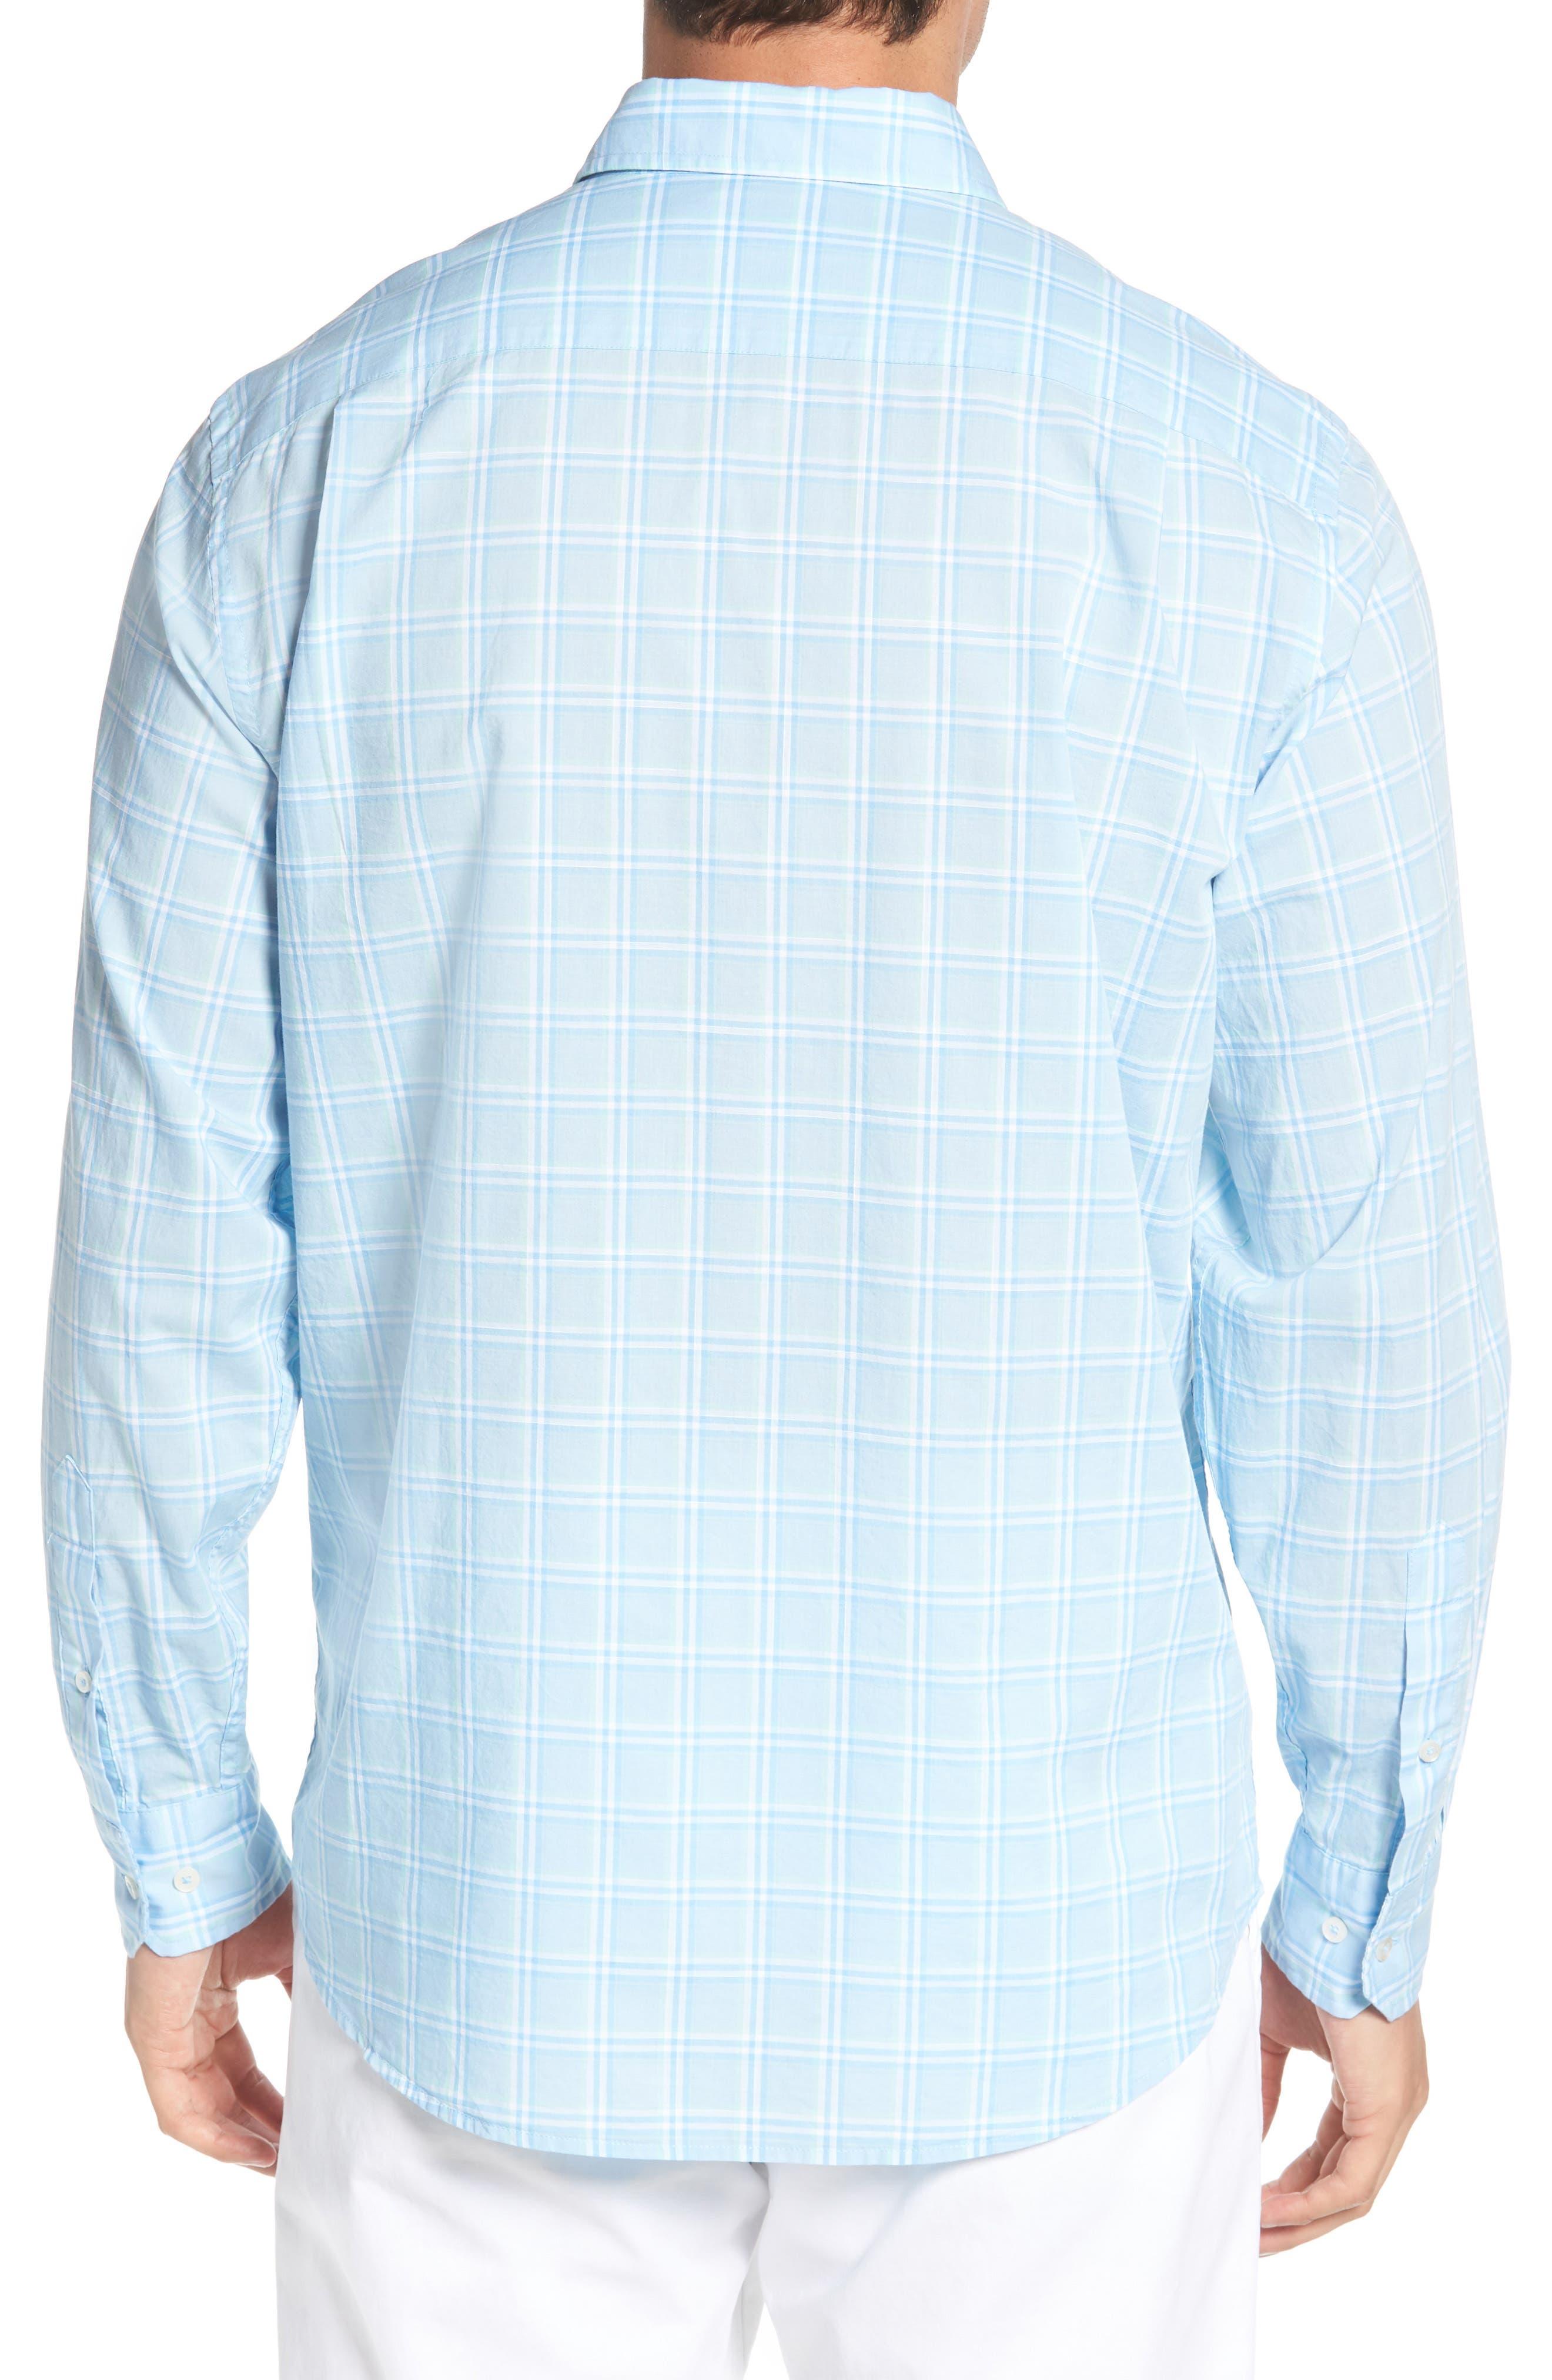 Roadstead Regular Fit Plaid Sport Shirt,                             Alternate thumbnail 2, color,                             450